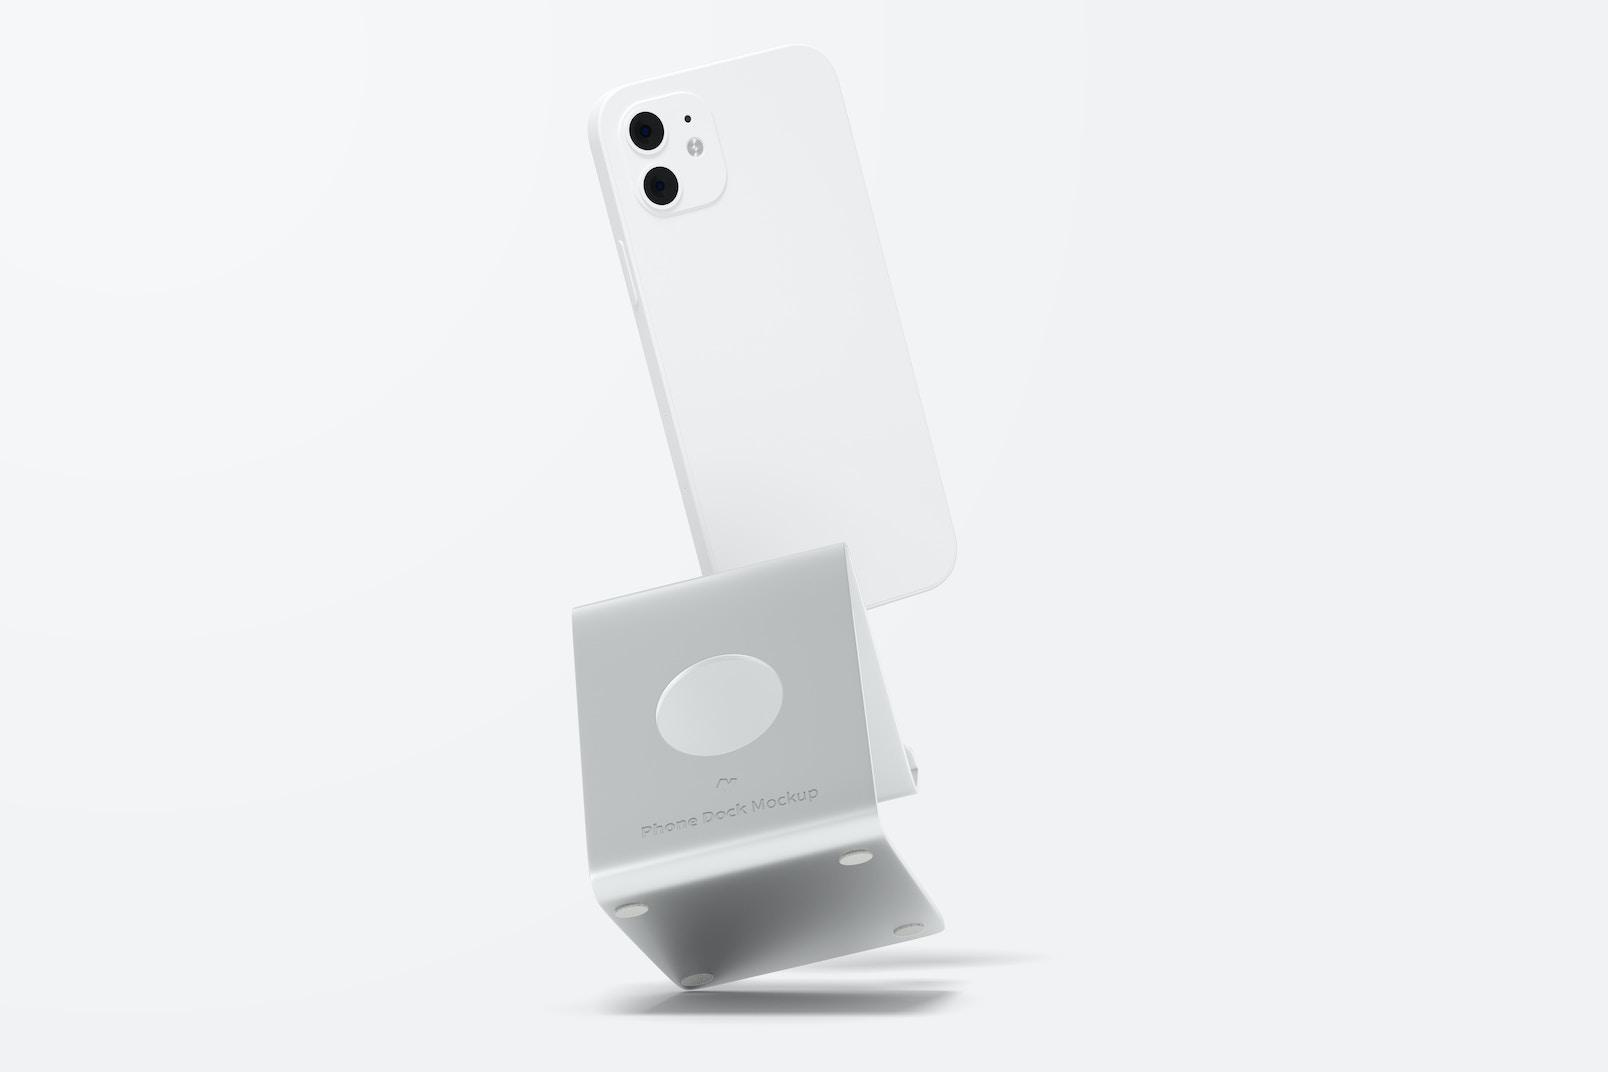 Phone Dock Mockup, Falling